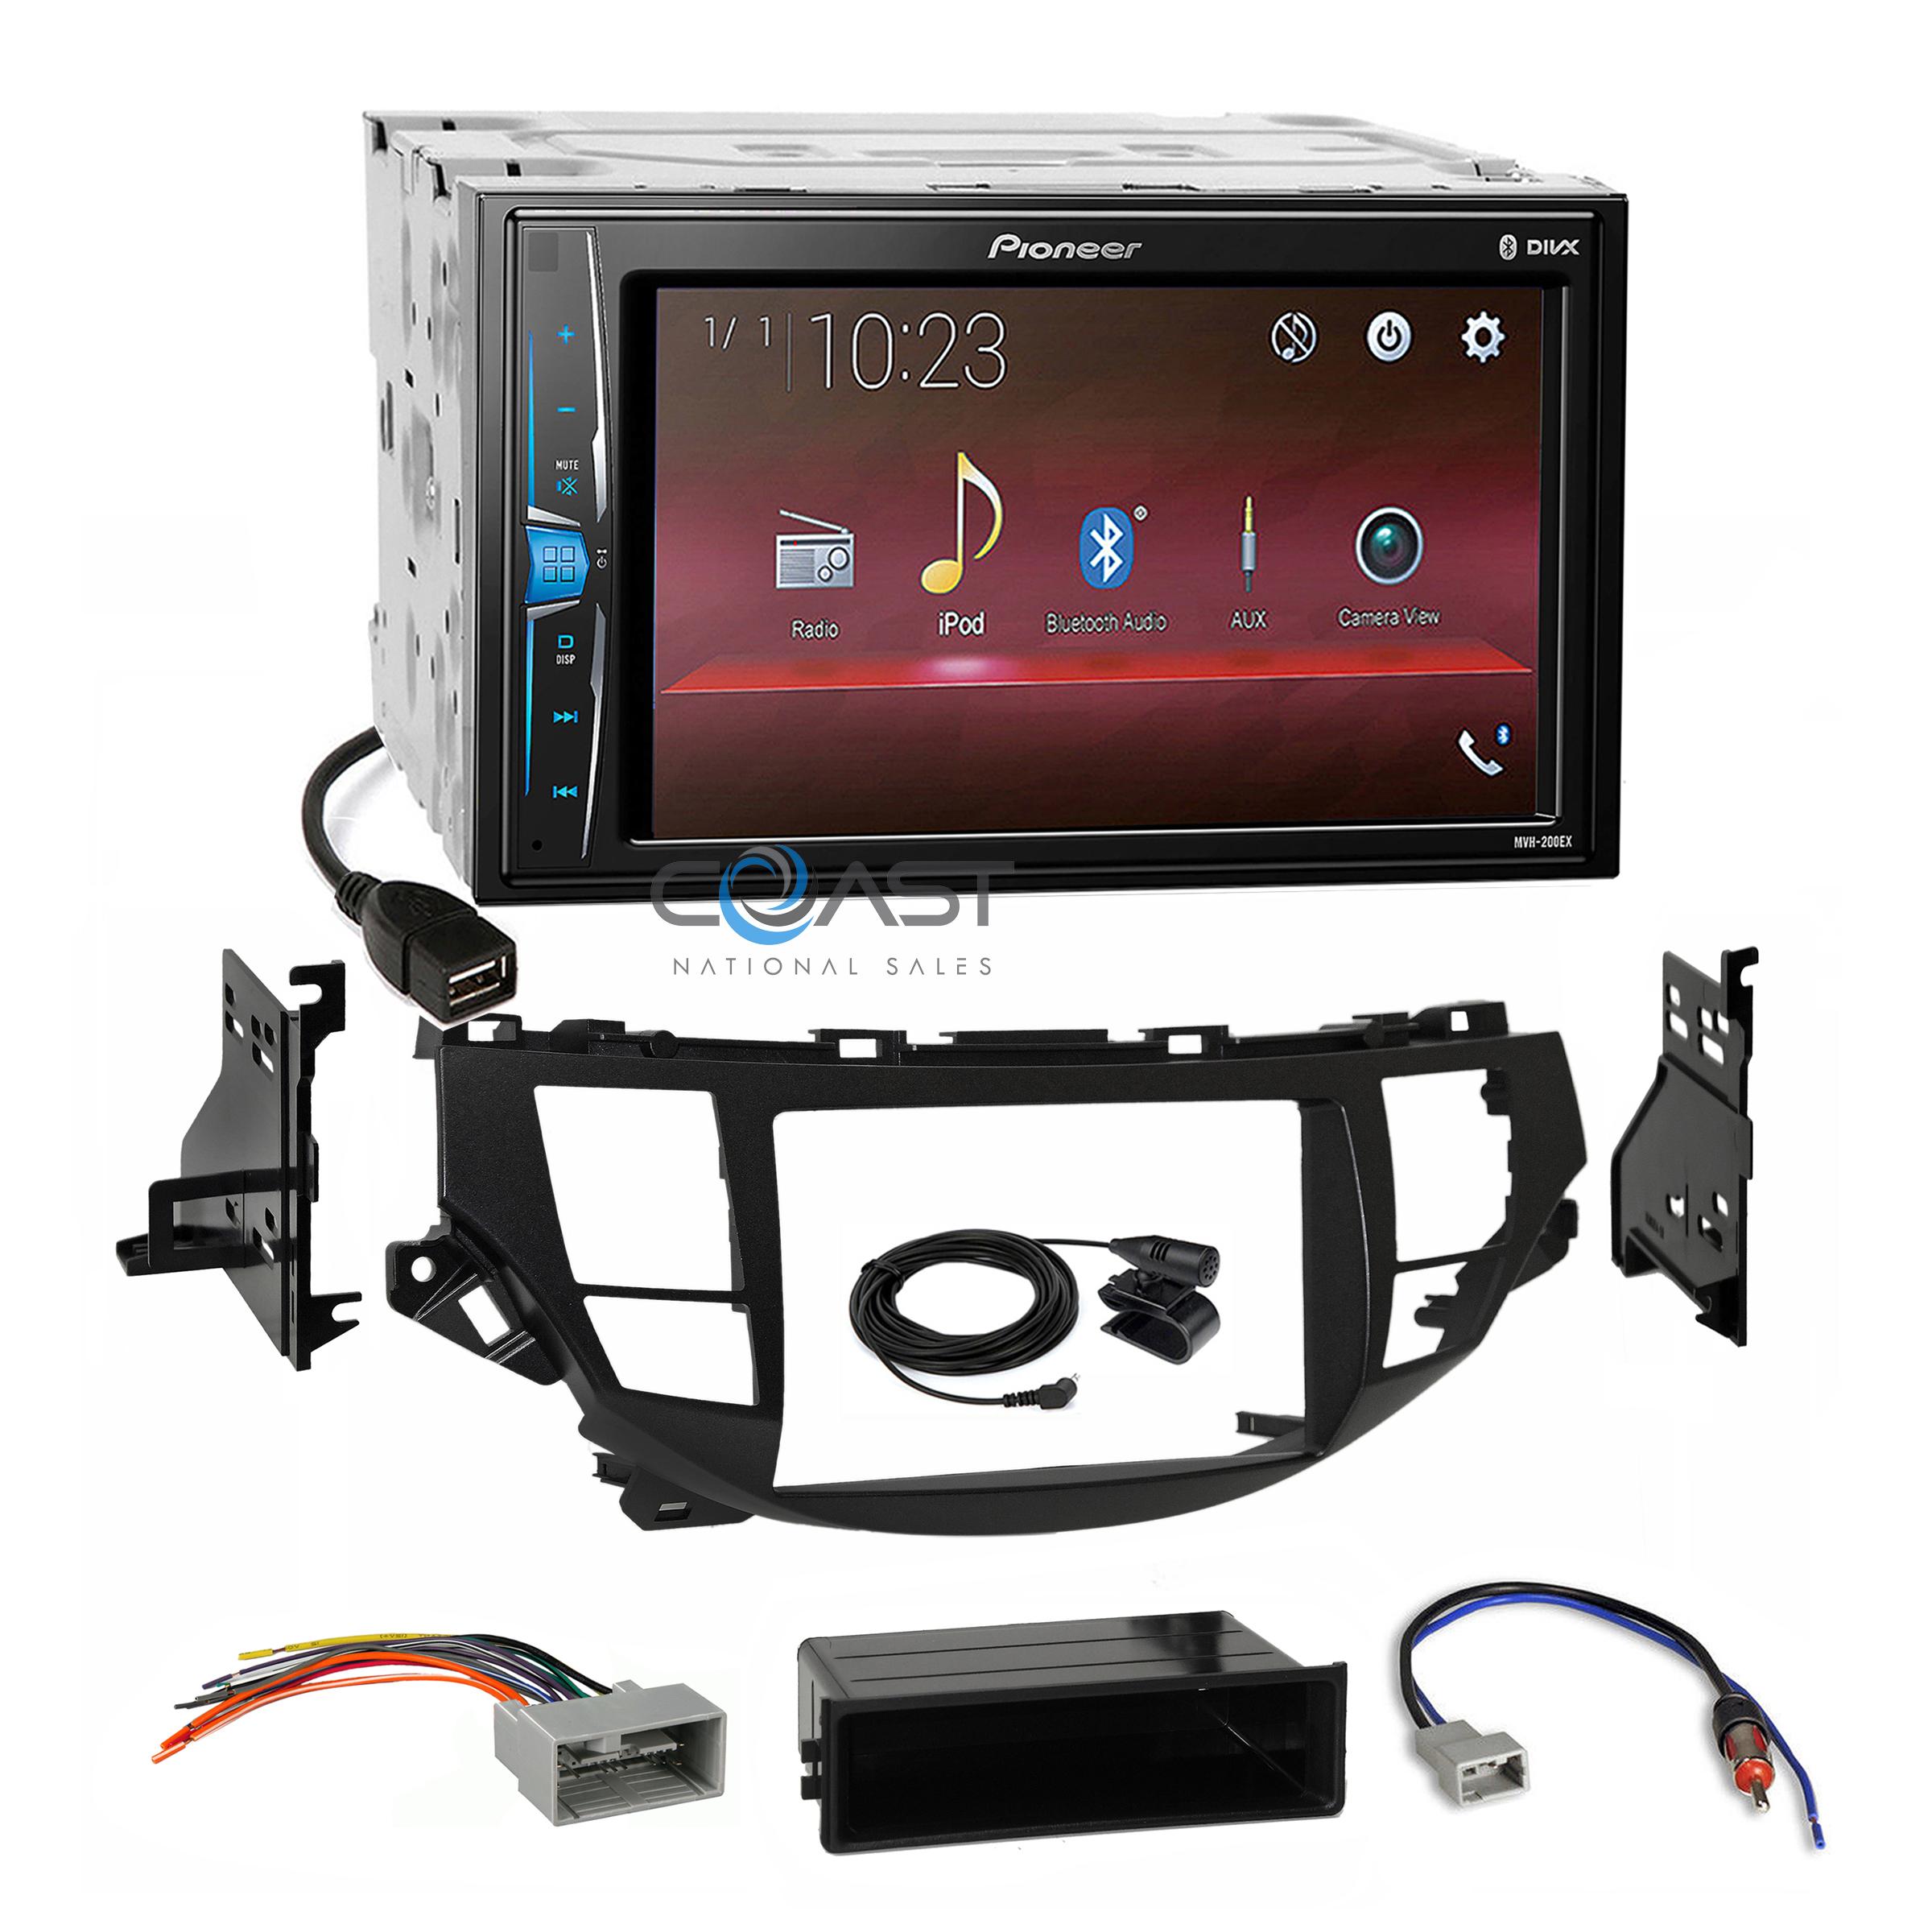 Pioneer 2018 USB Stereo Taupe Dash Kit Harness for 08-12 Honda Accord Crosstour